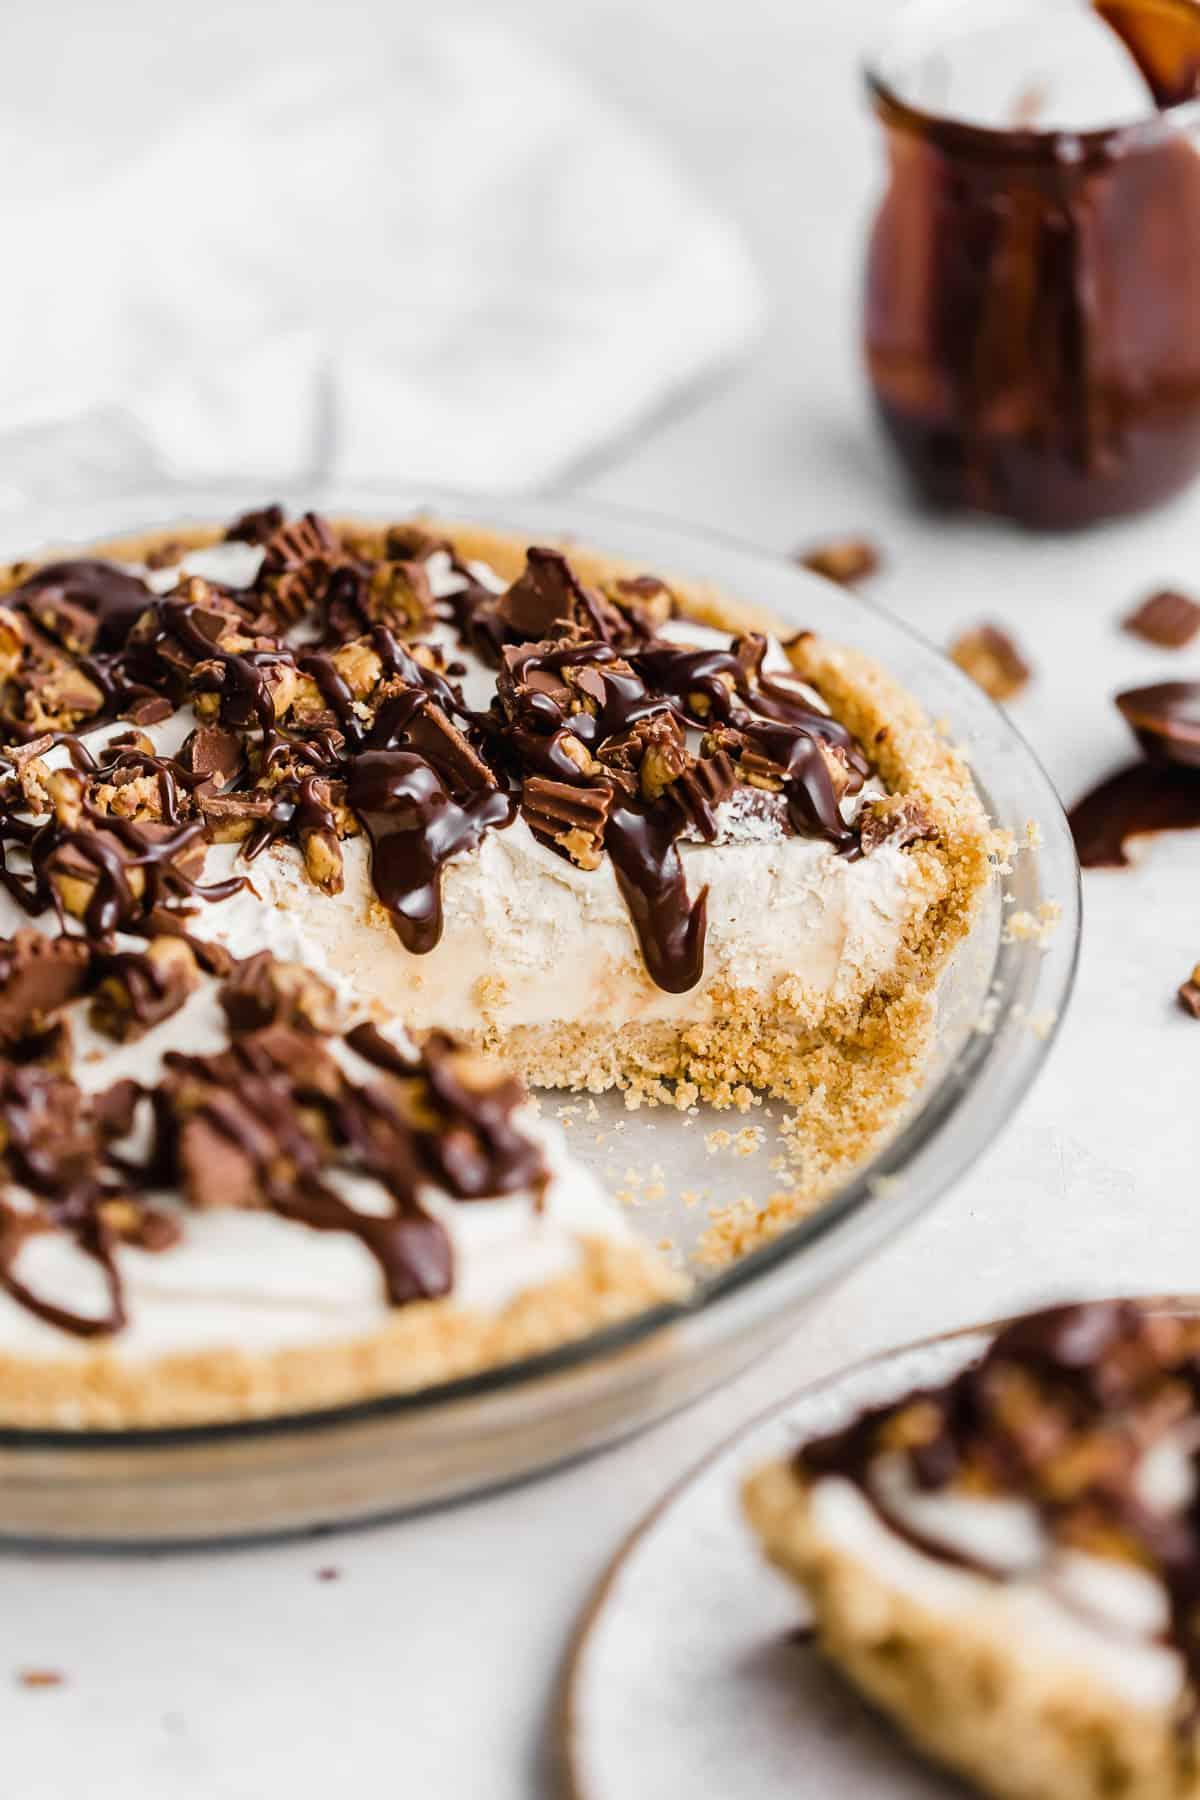 Hot fudge drizzled overtop a No-Bake Peanut Butter Pie in a graham cracker crust.